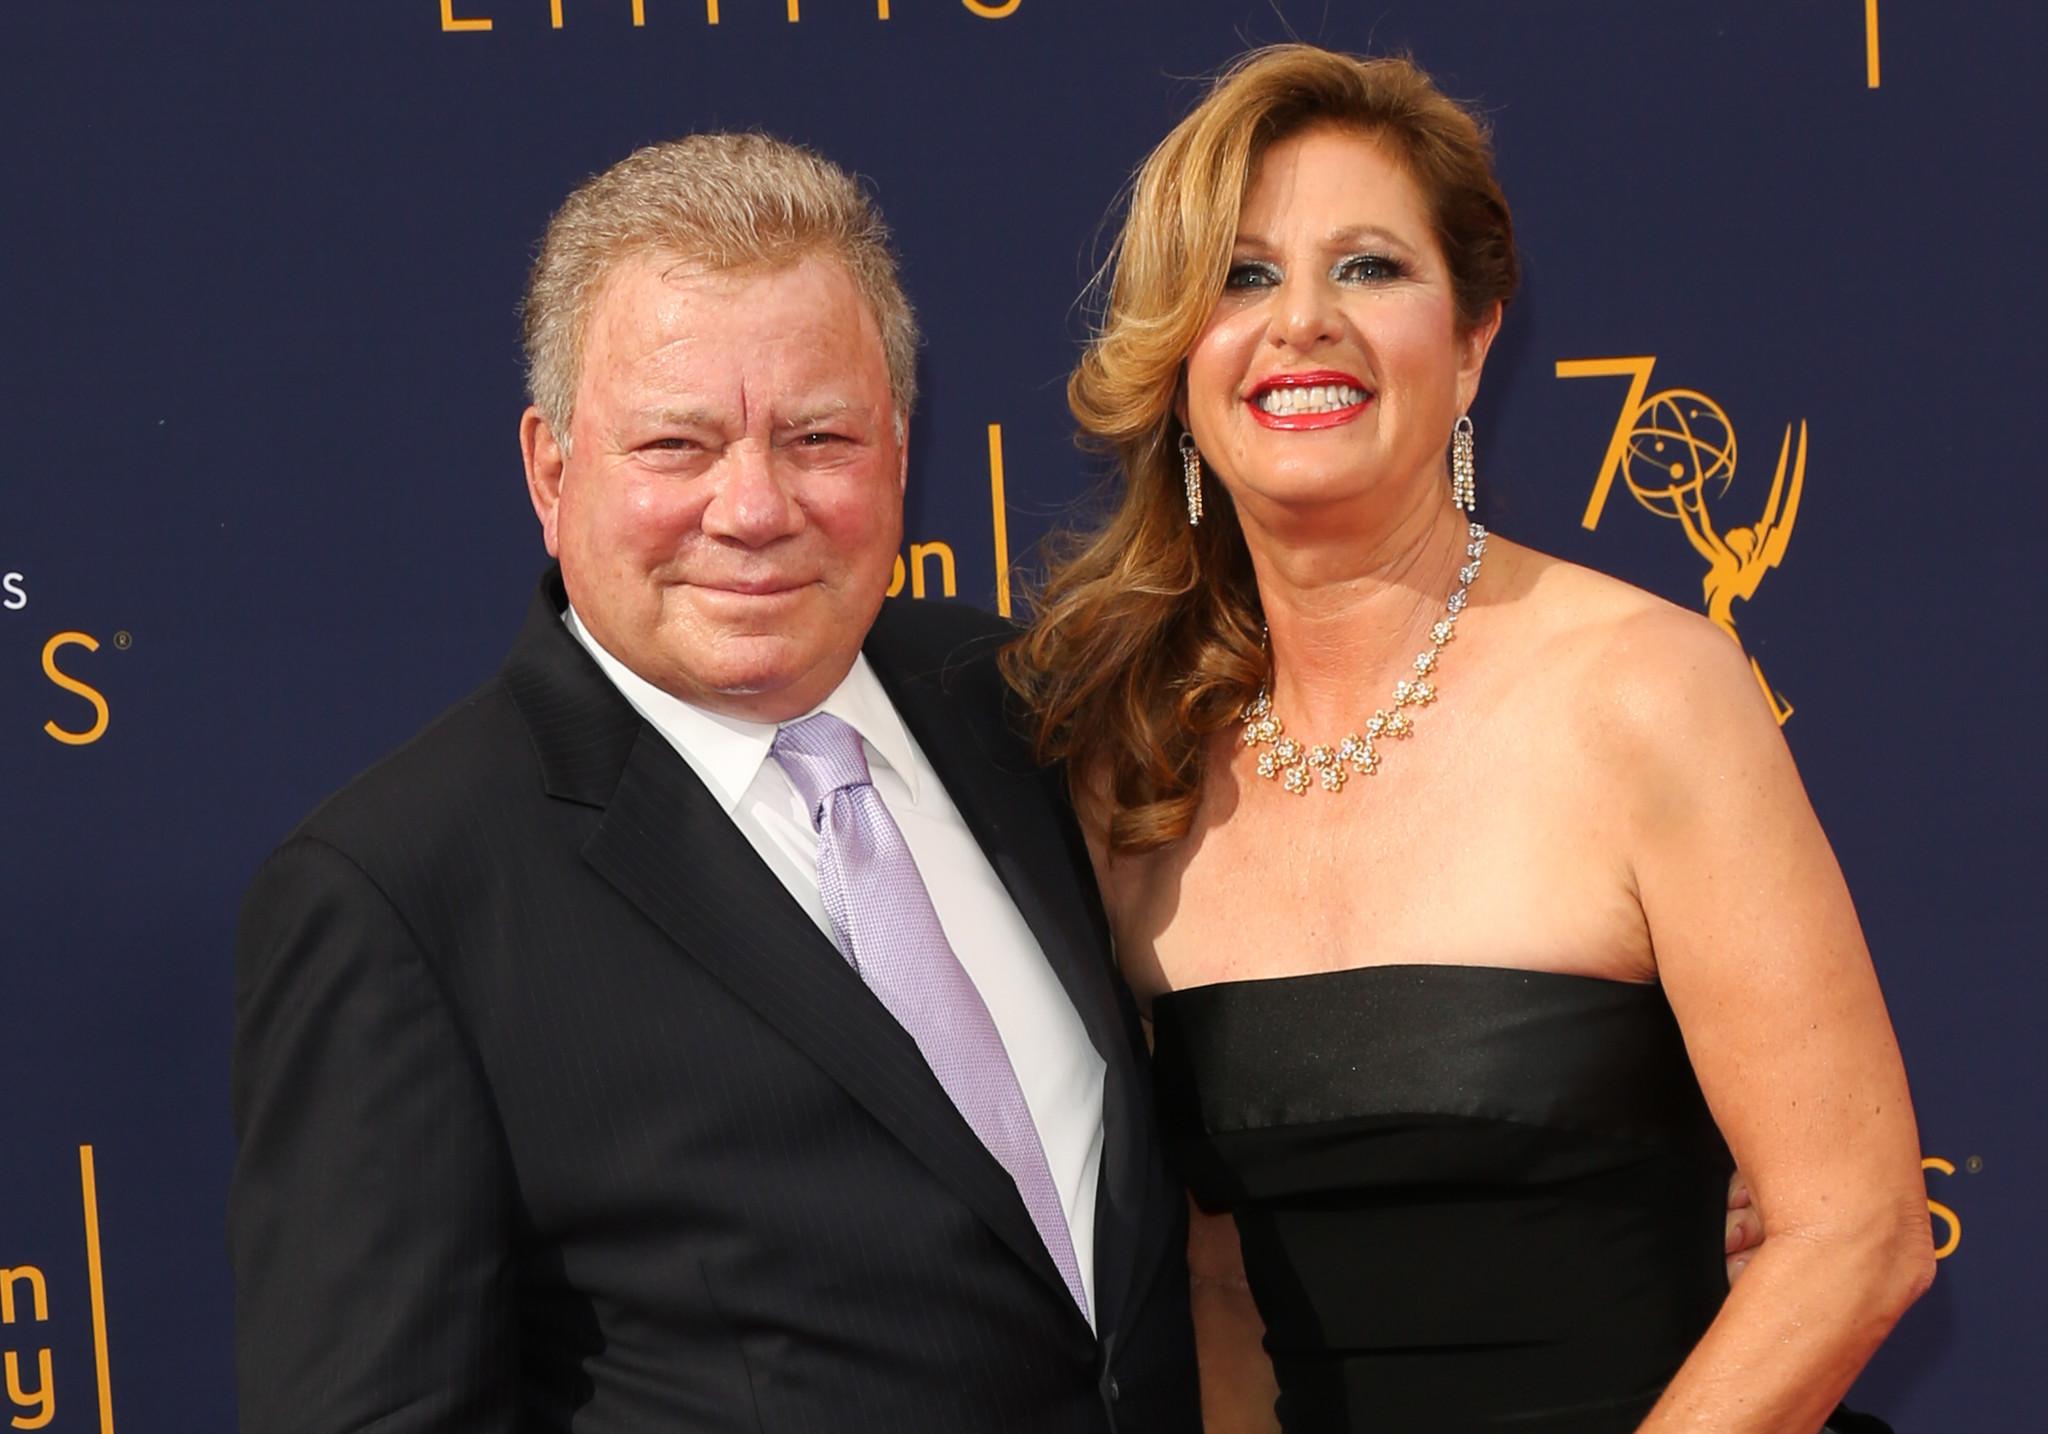 William Shatner's divorce settlement won't put dent into $100 million fortune